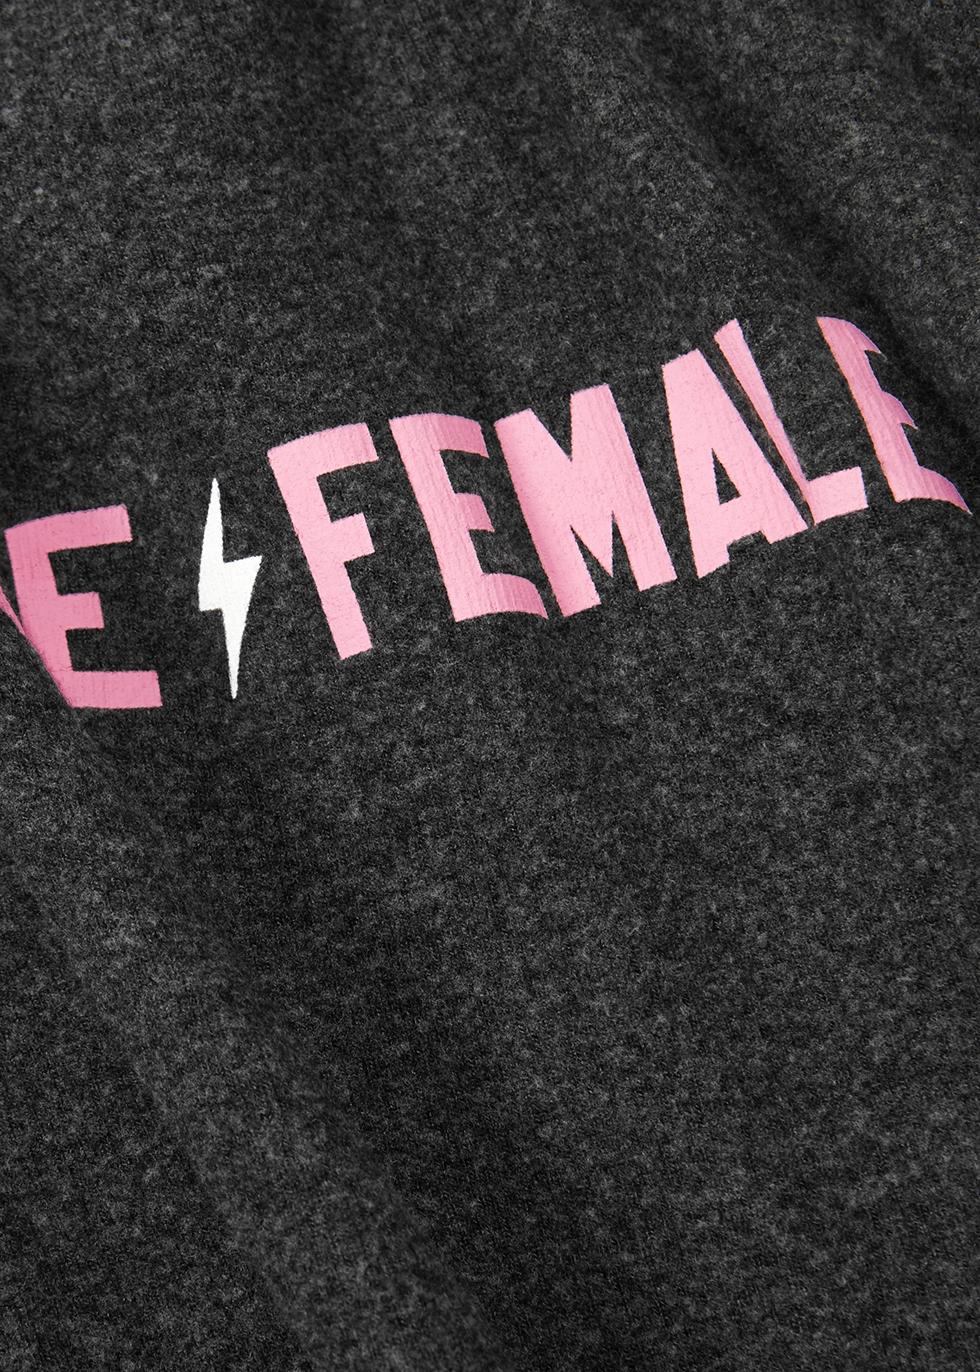 Fierce Female printed fleece sweatshirt - Wildfox